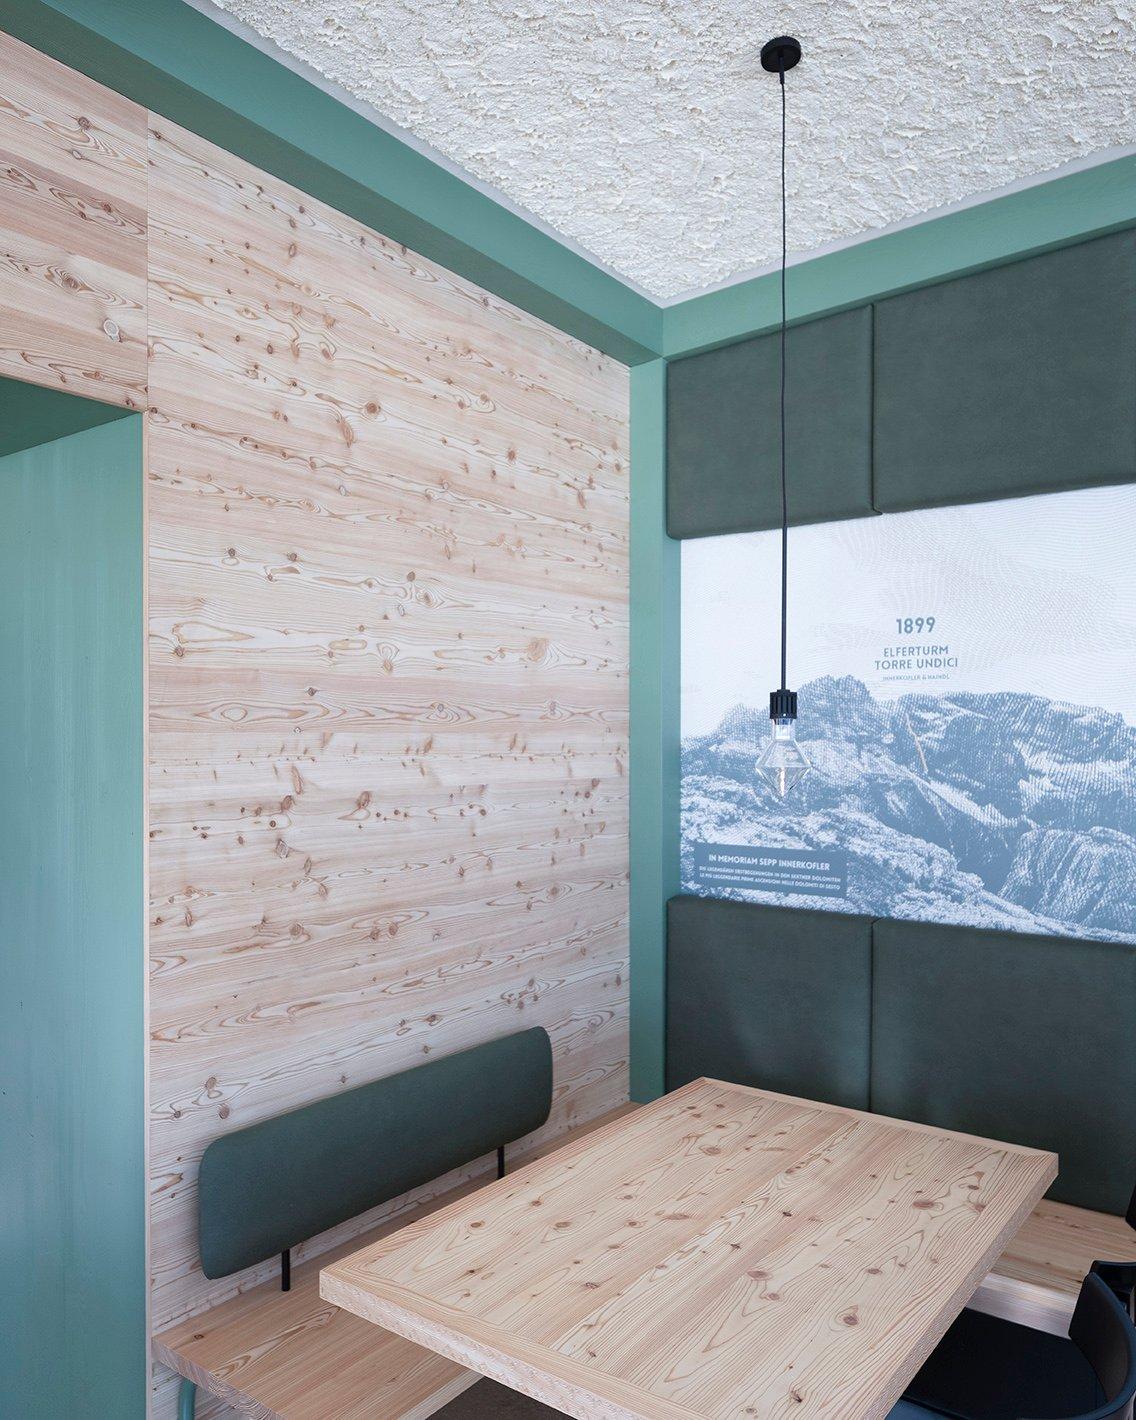 Bistro Bergsteiger - Plasma Studio - Florian Jaenicke